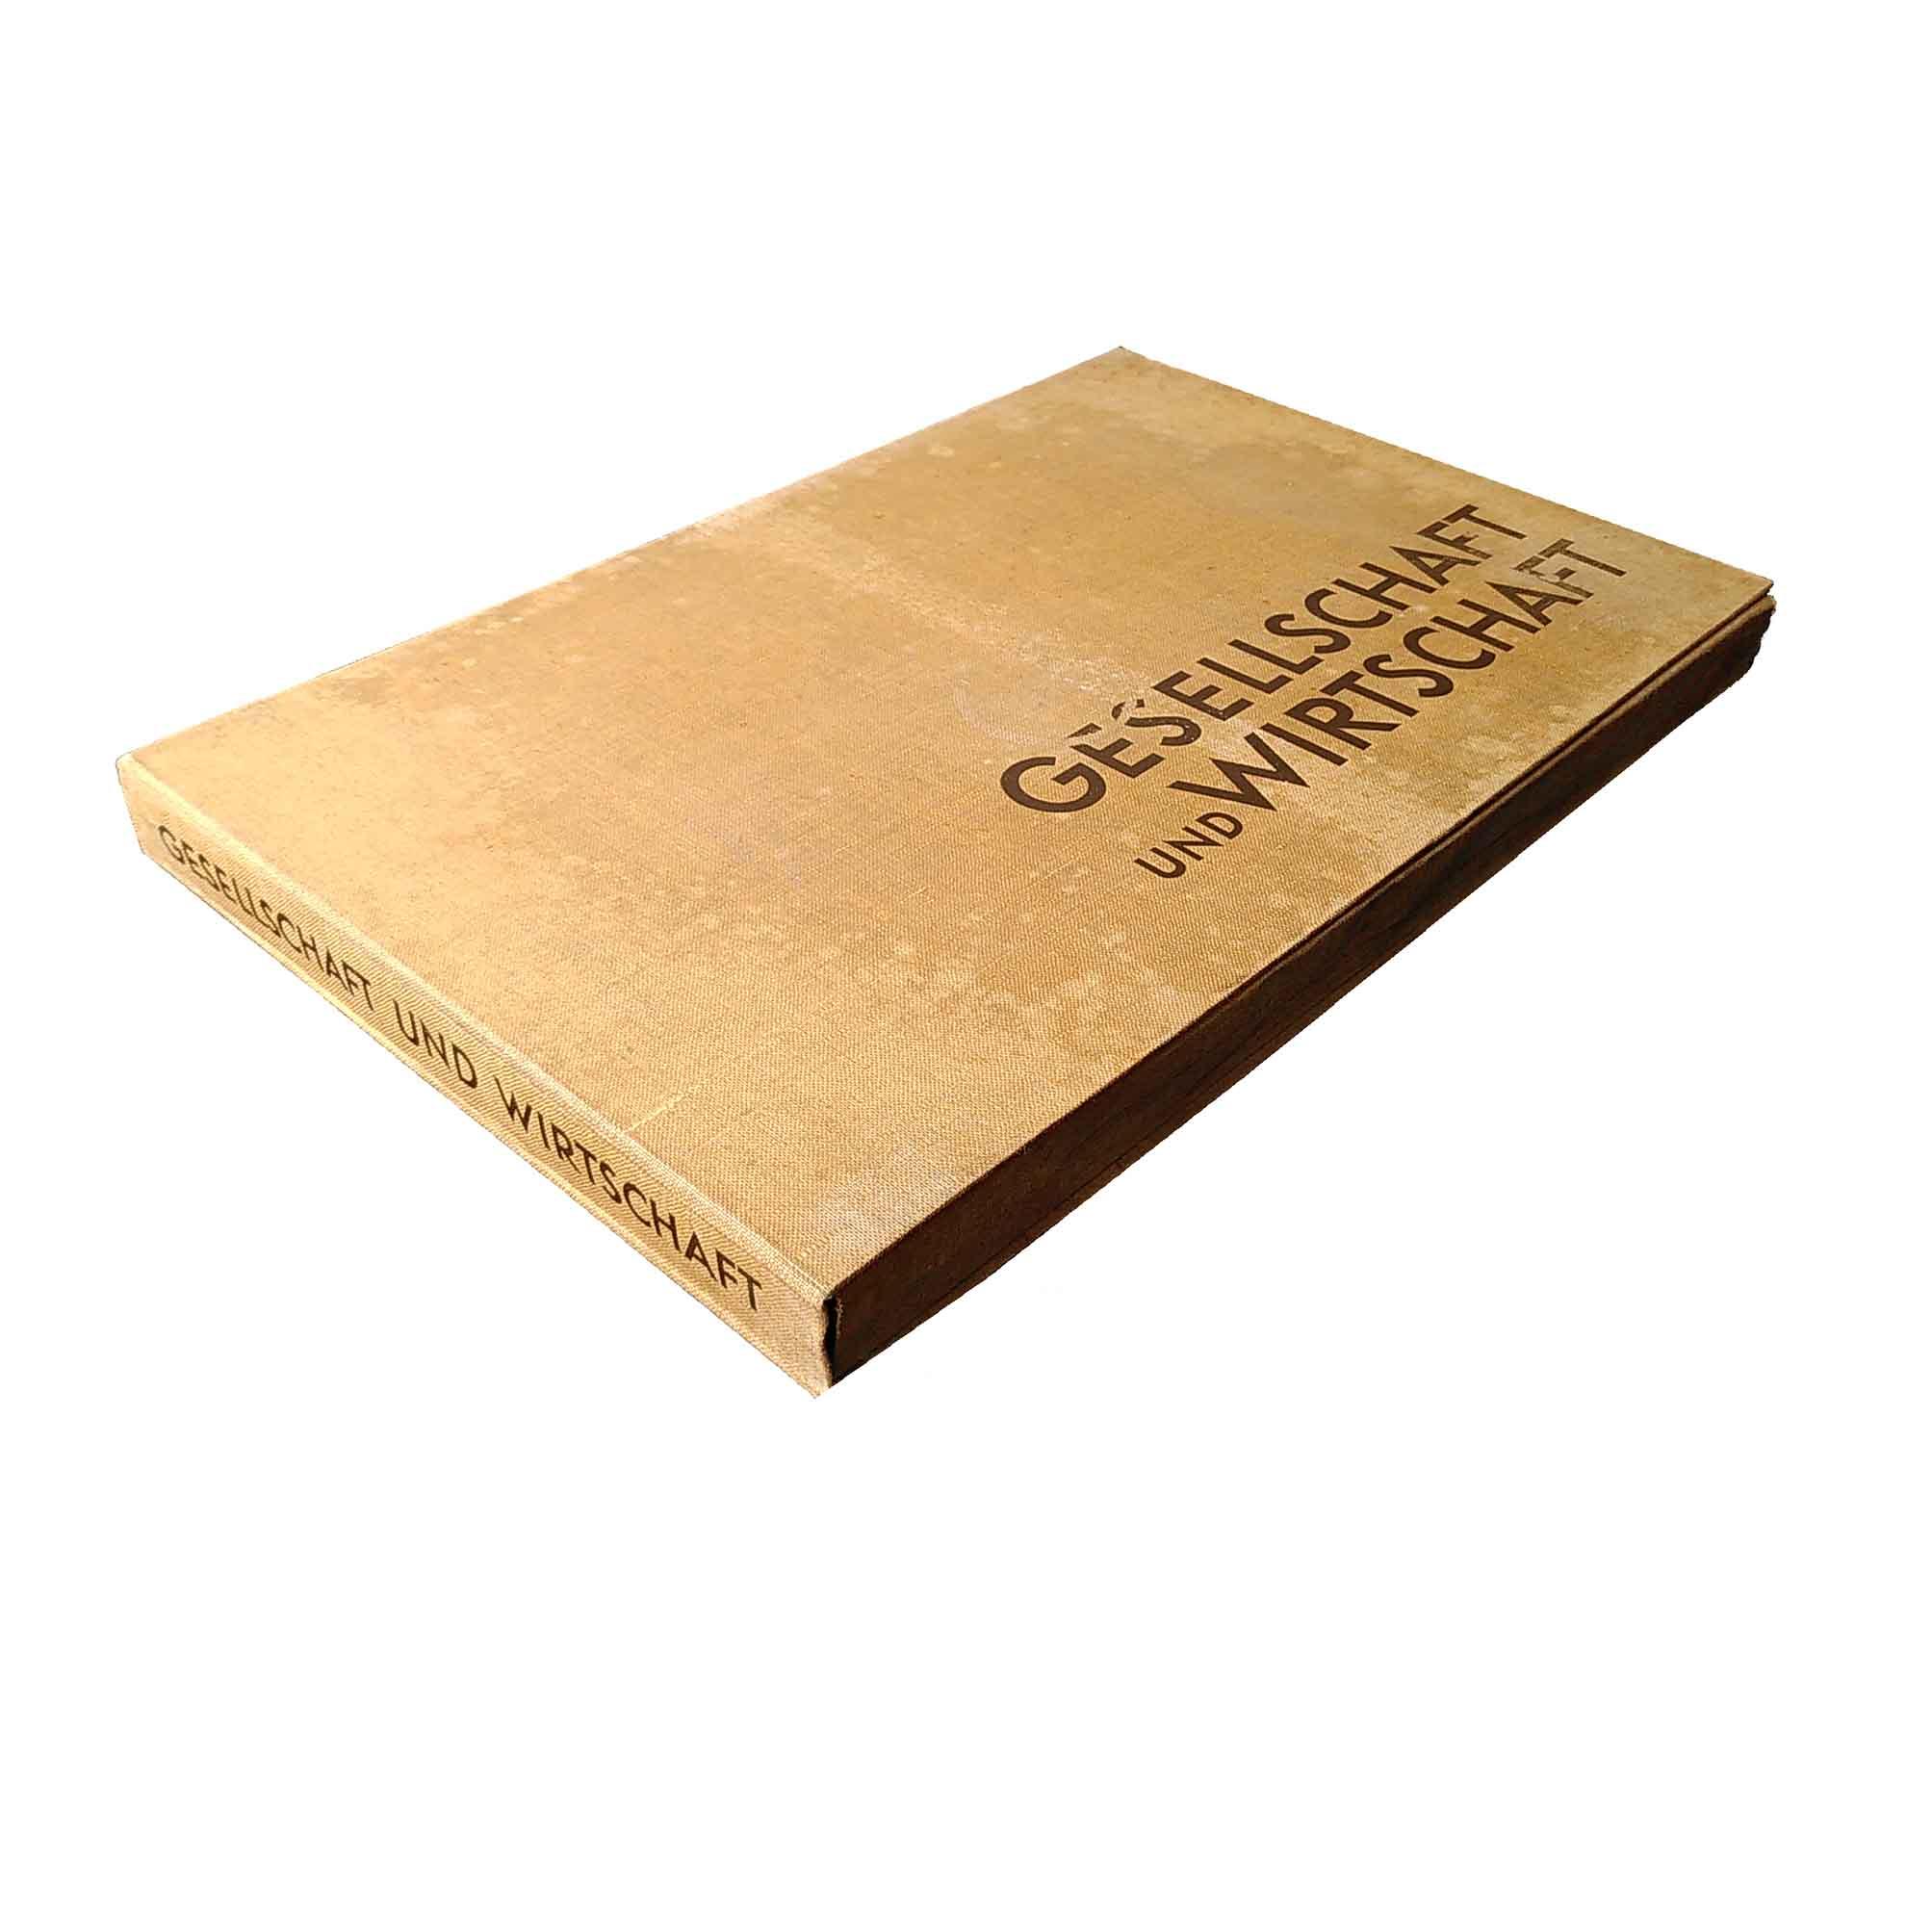 Neurath Gesellschaft Wirtschaft Atlas 1930 Clamshell Box Spine free N